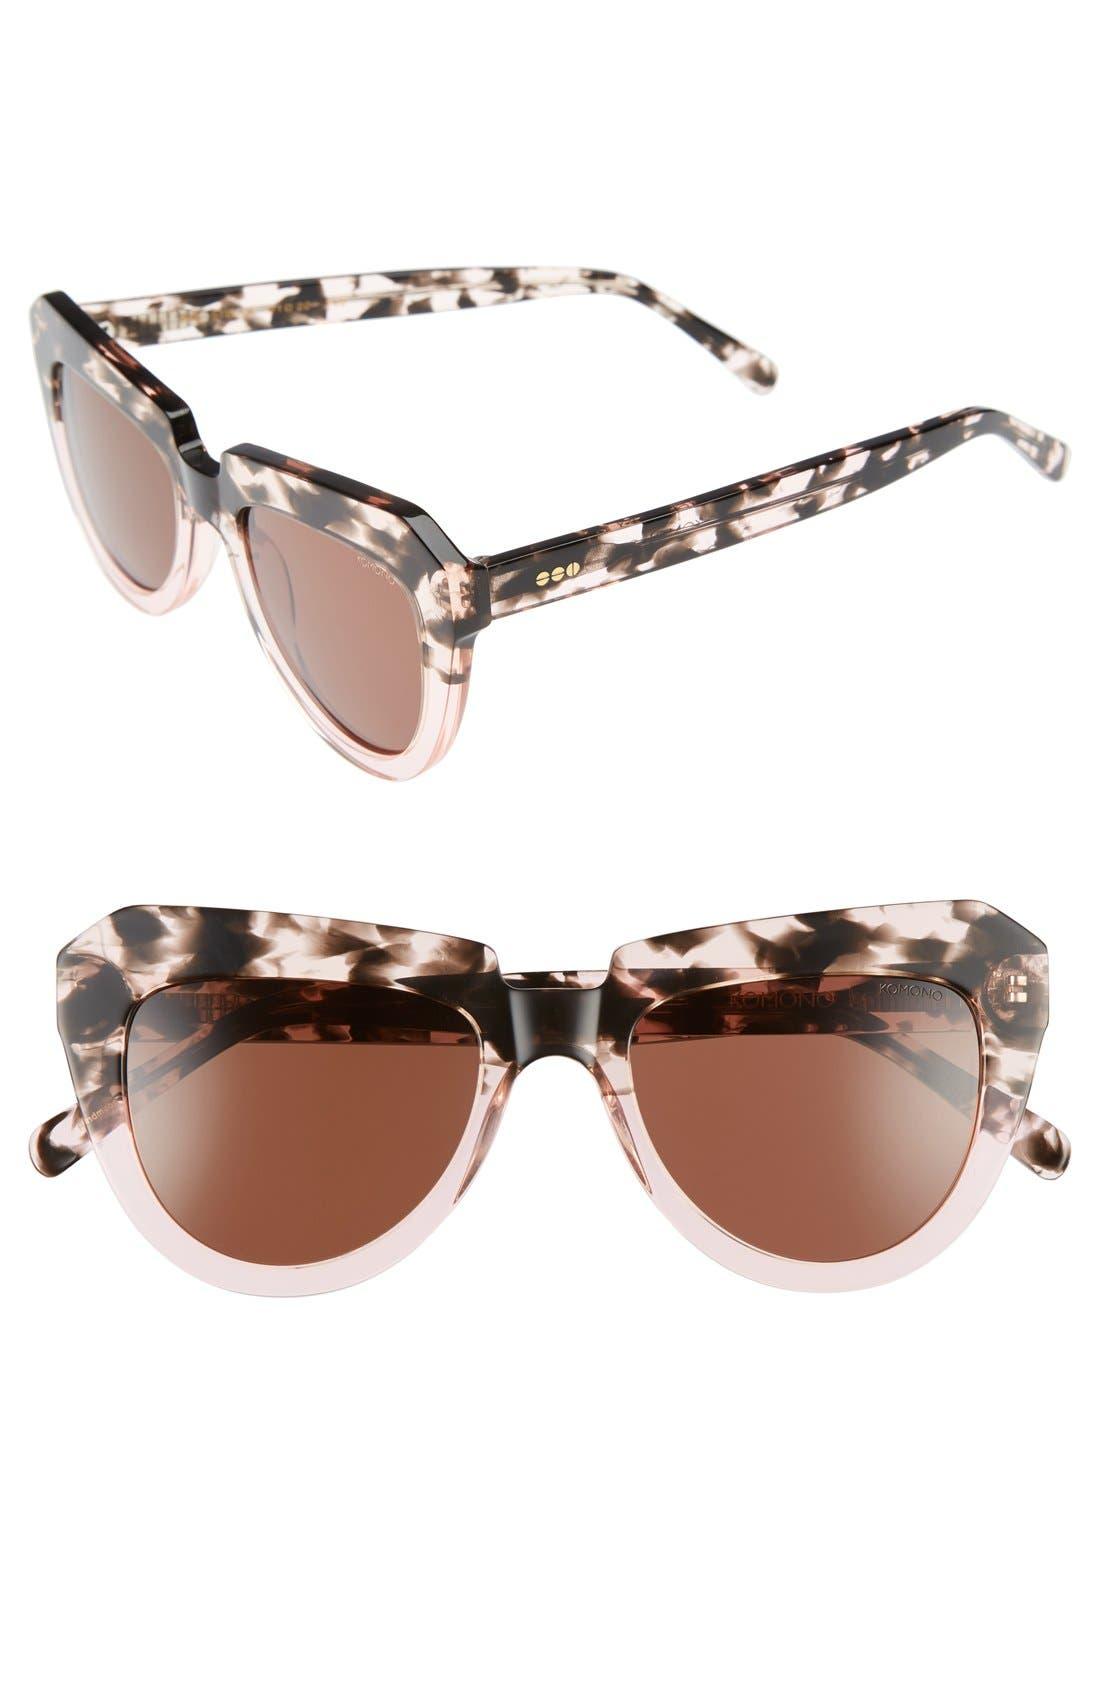 Stella 51mm Sunglasses,                             Main thumbnail 1, color,                             Rose Dust